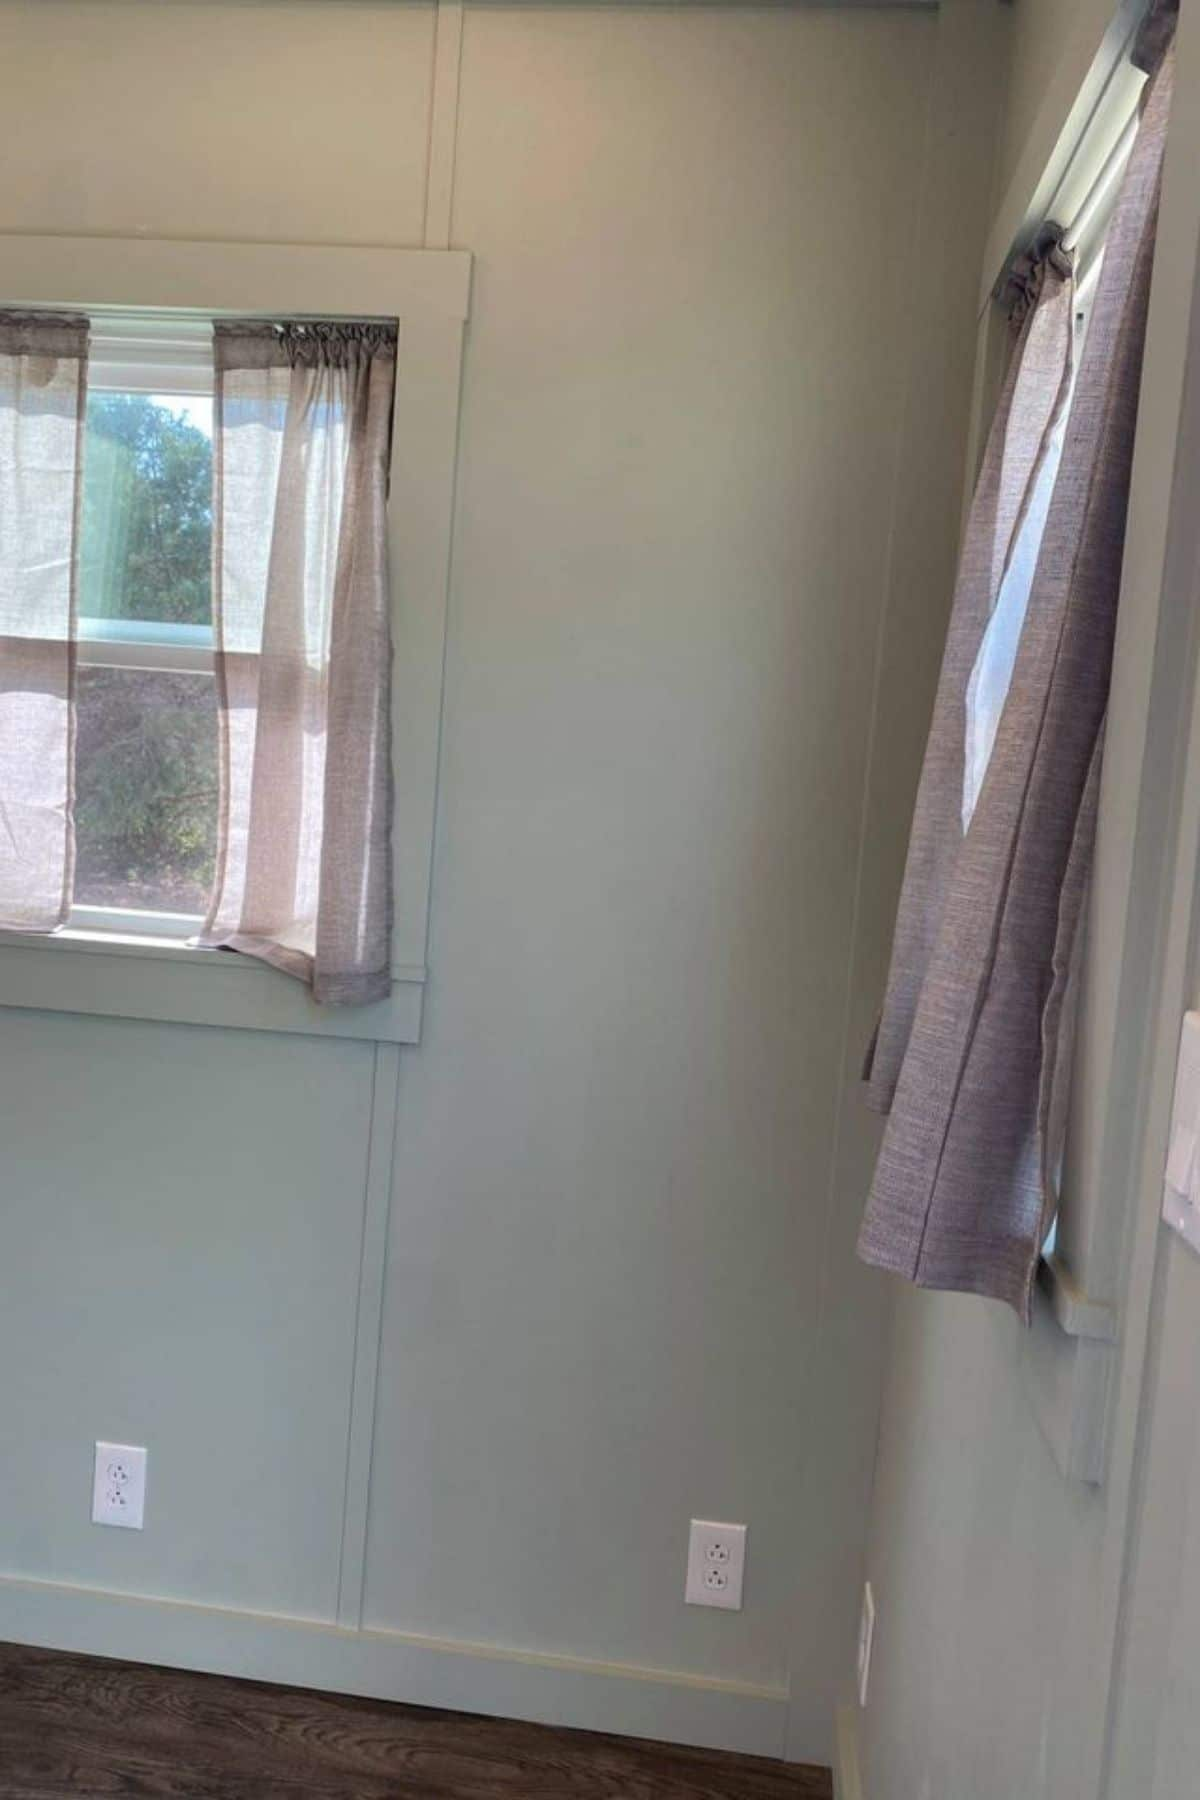 Windows against light green wall